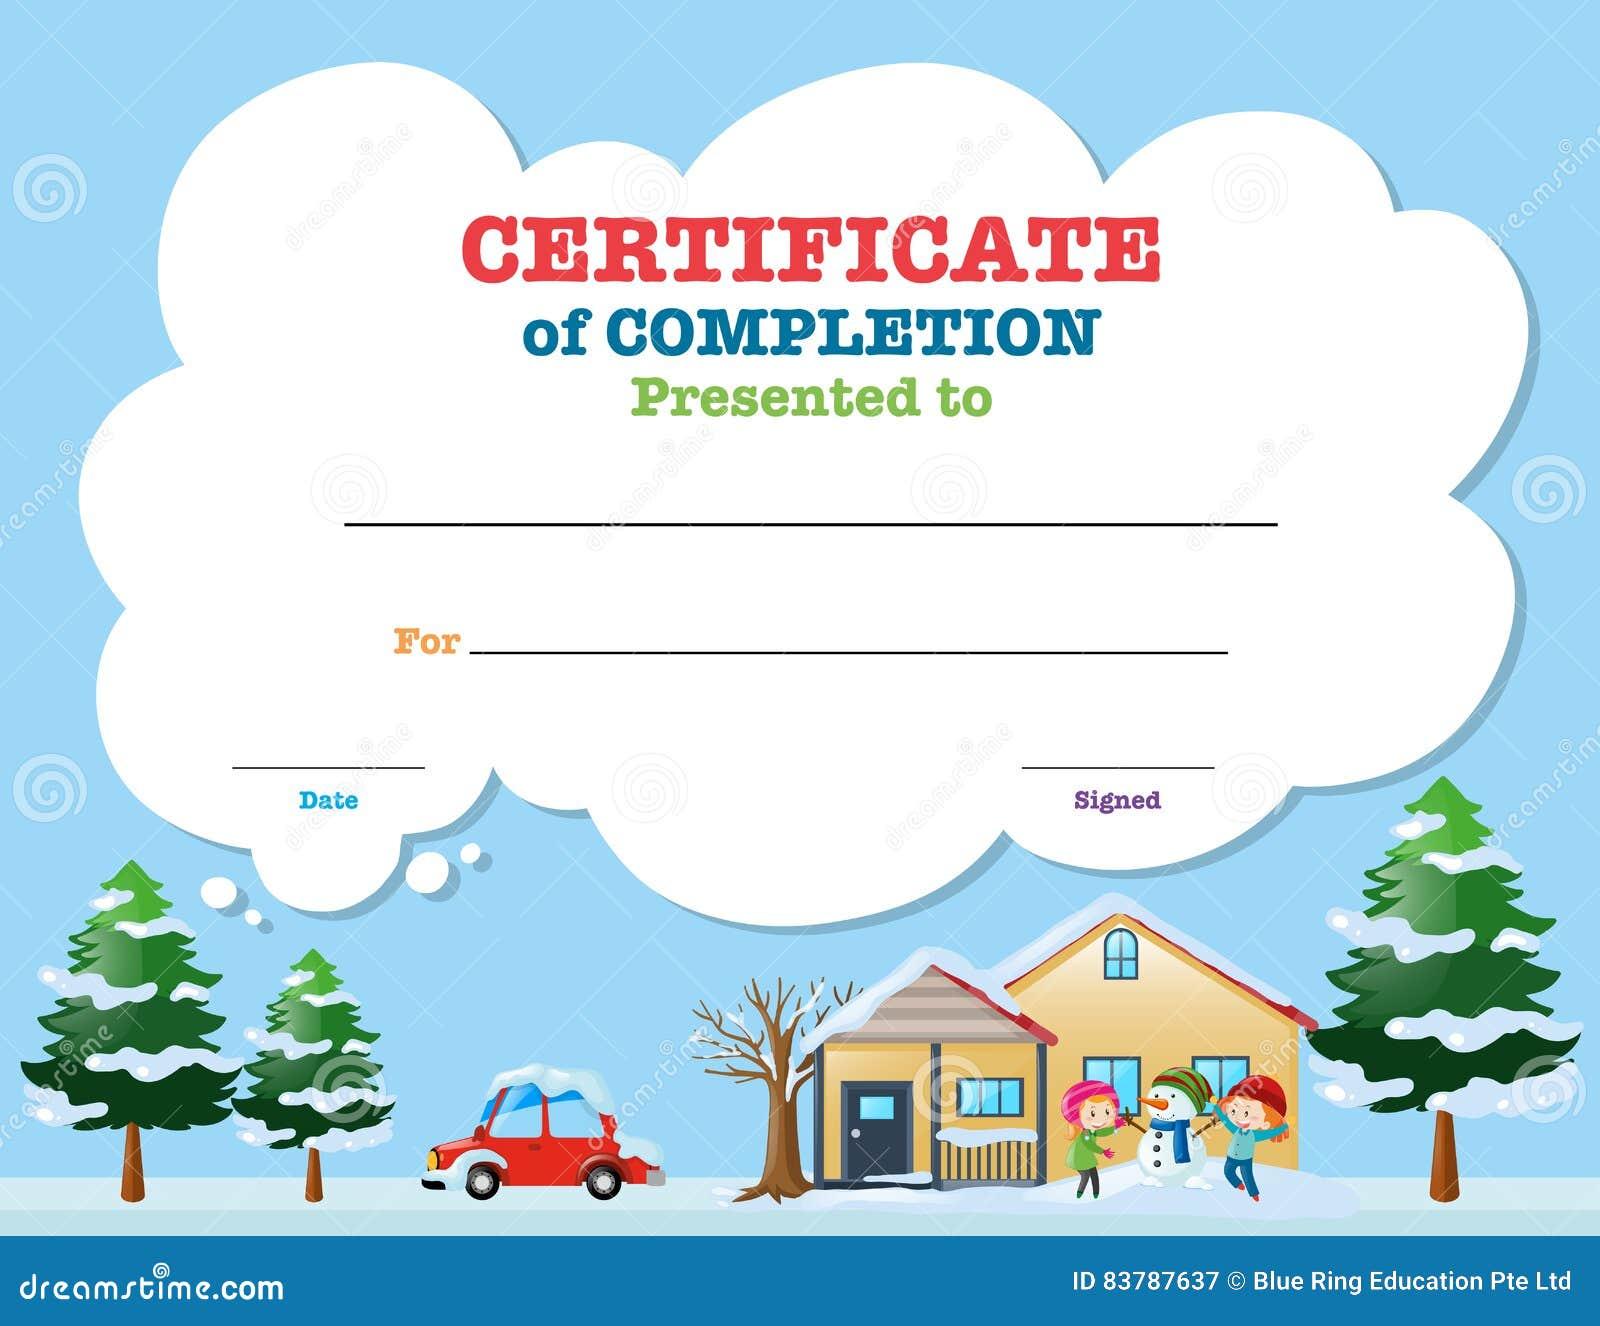 certificate template kids in winter stock vector image certificate template kids in winter